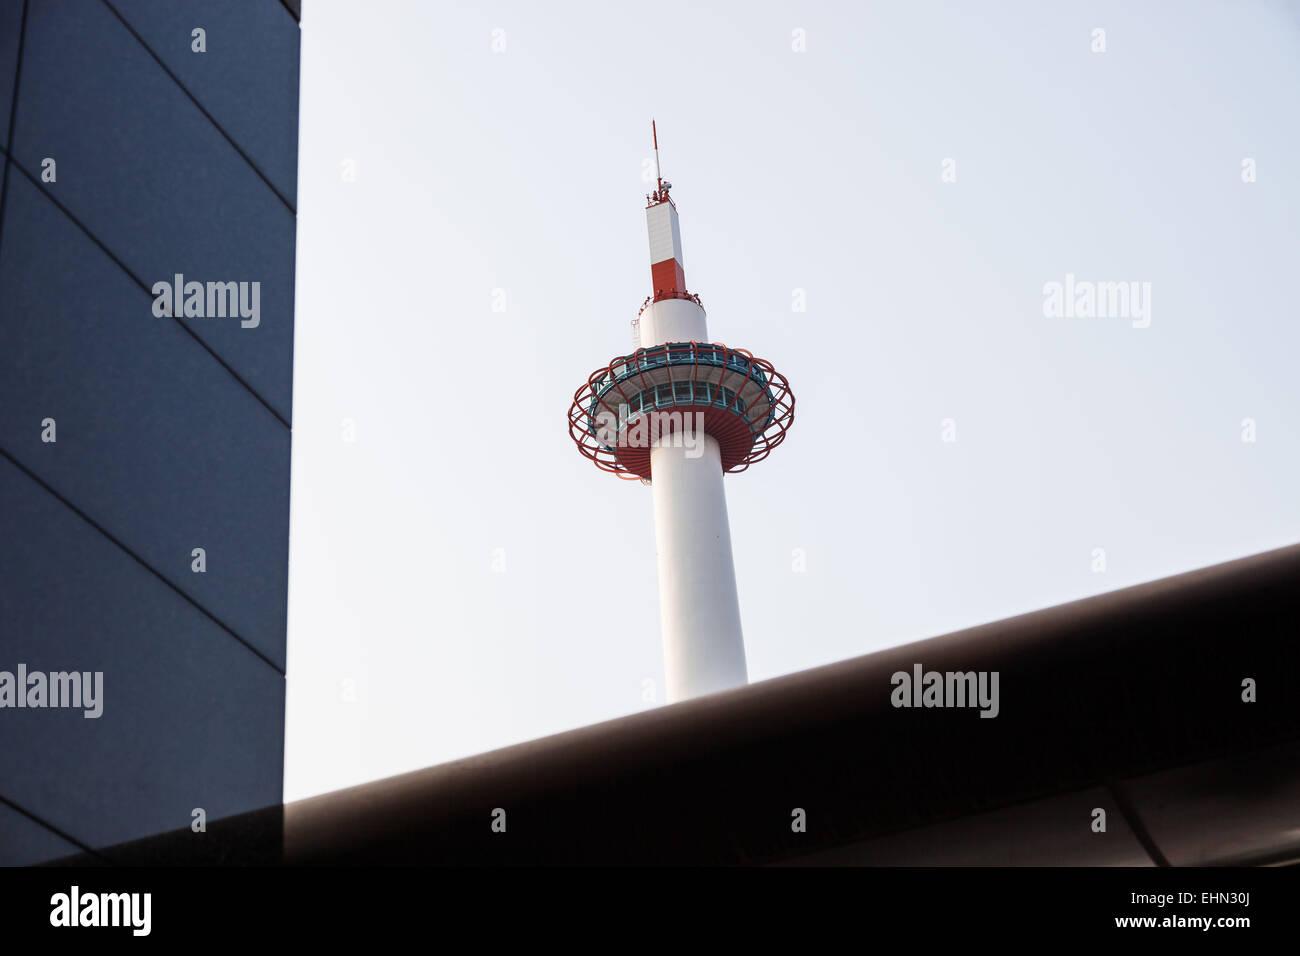 Kyoto tower, Japon. - Stock Image